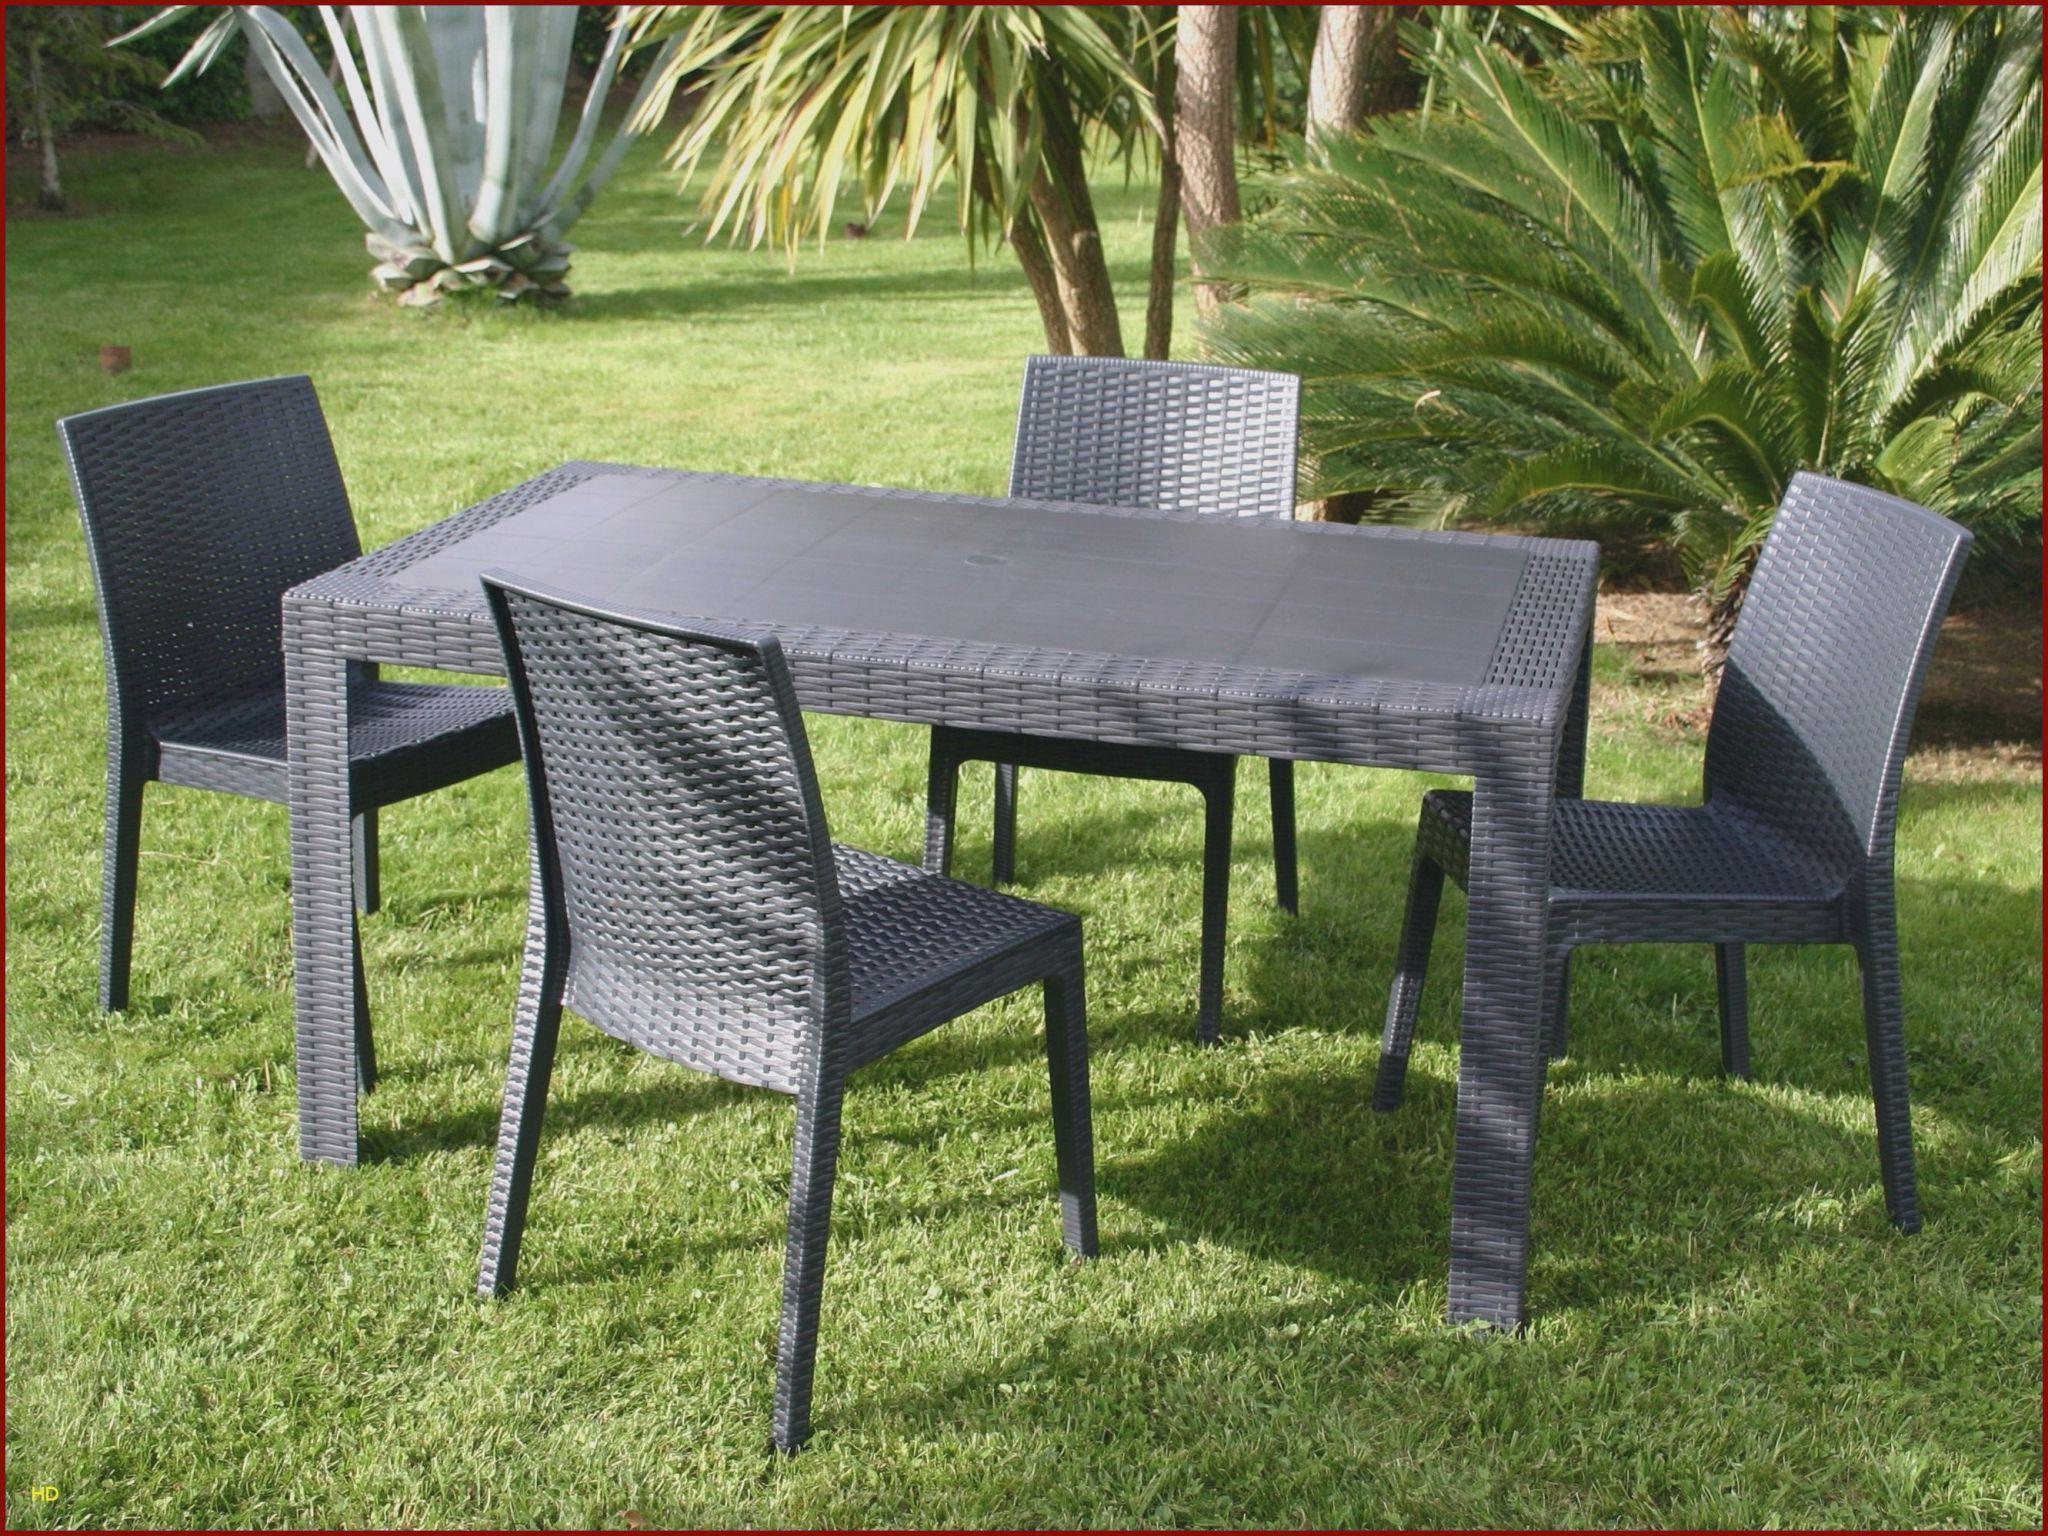 Table De Jardin 10 Personnes Charmant Chaises Luxe Chaise Ice 0d Table Jardin Resine Lovely